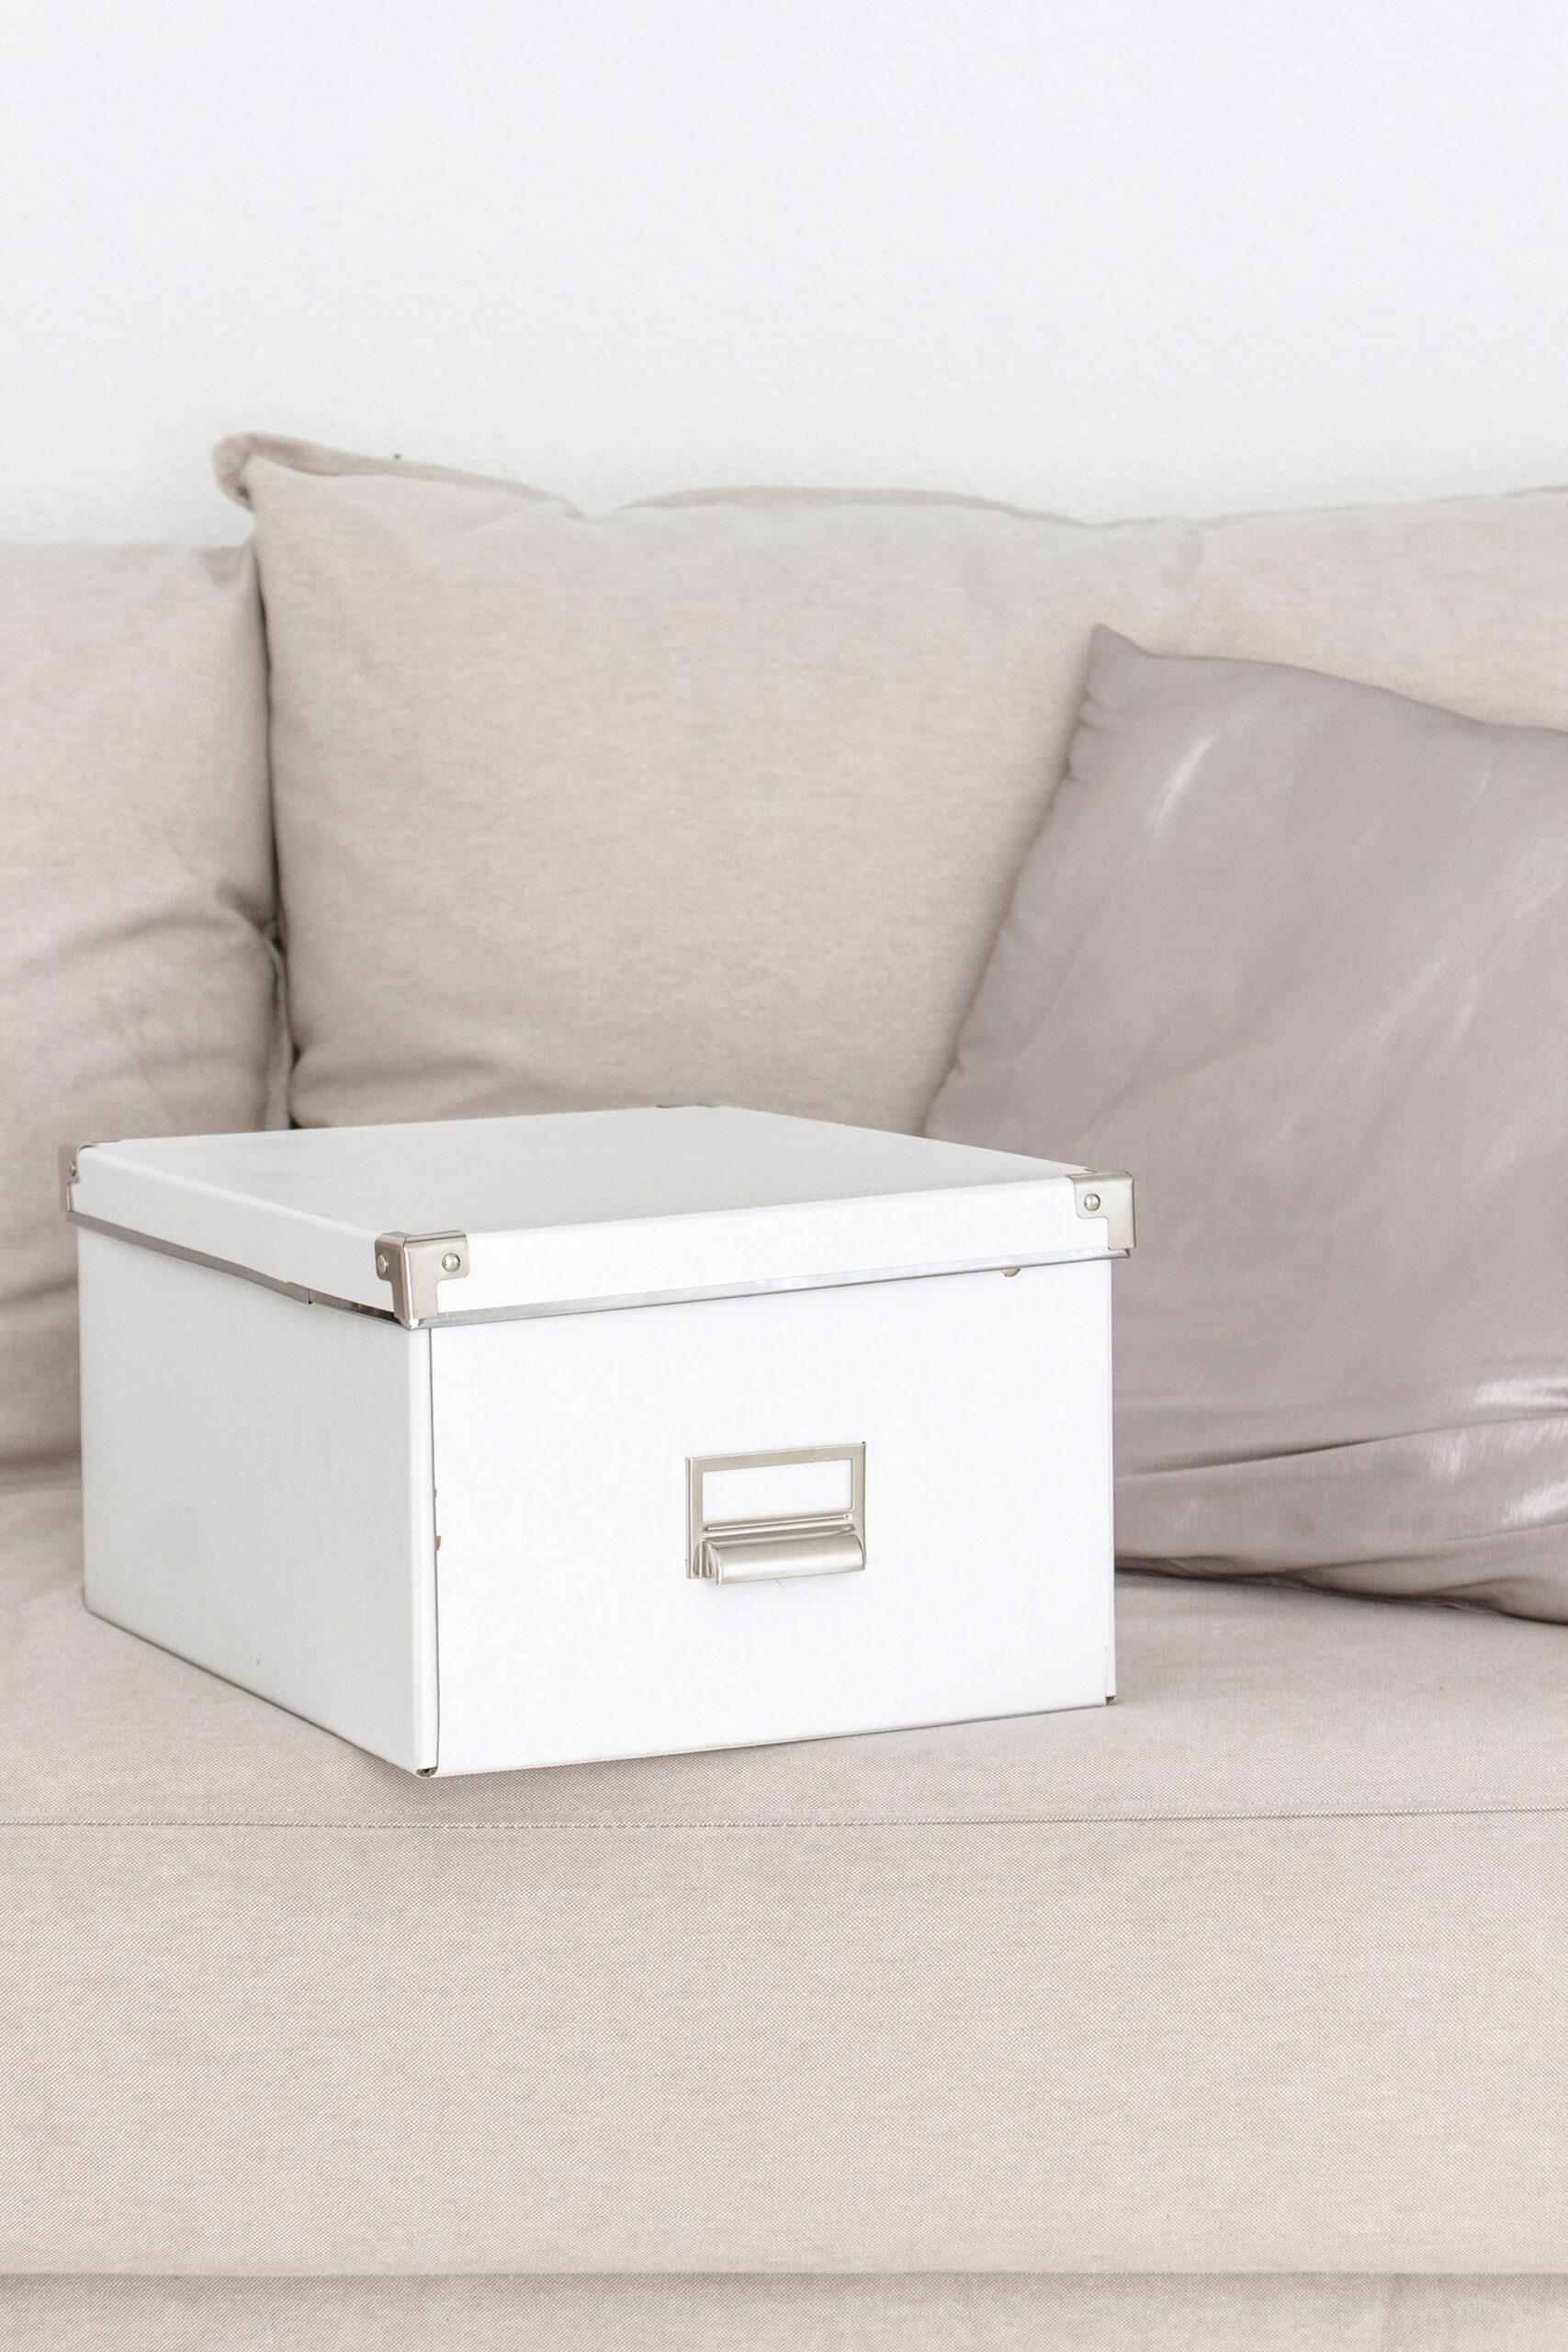 moving storage box